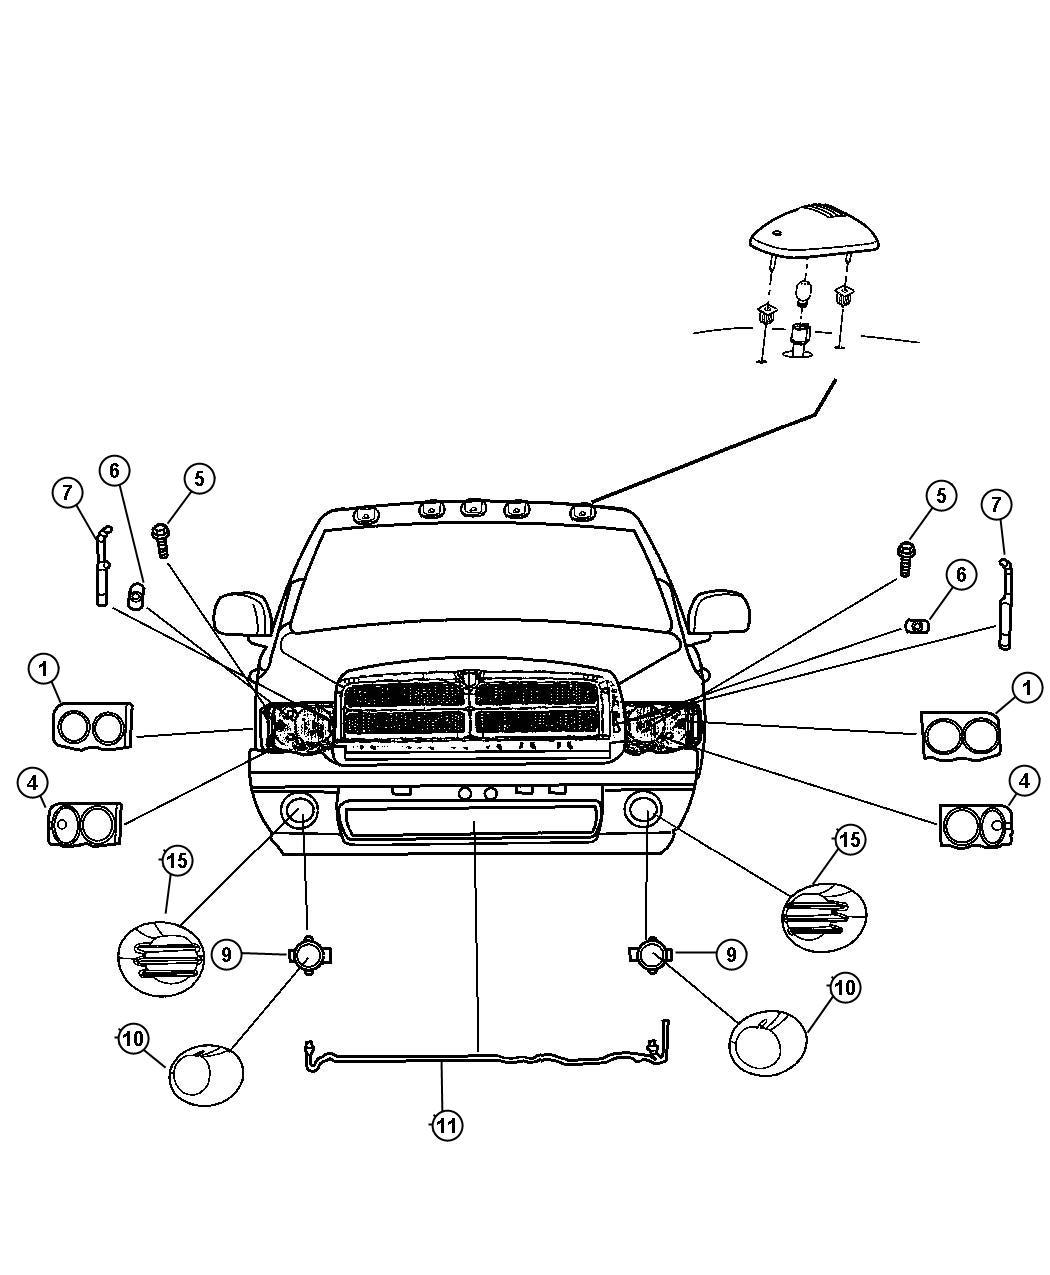 2006 Dodge Ram 2500 Lamp. Right. Headlamp park and turn